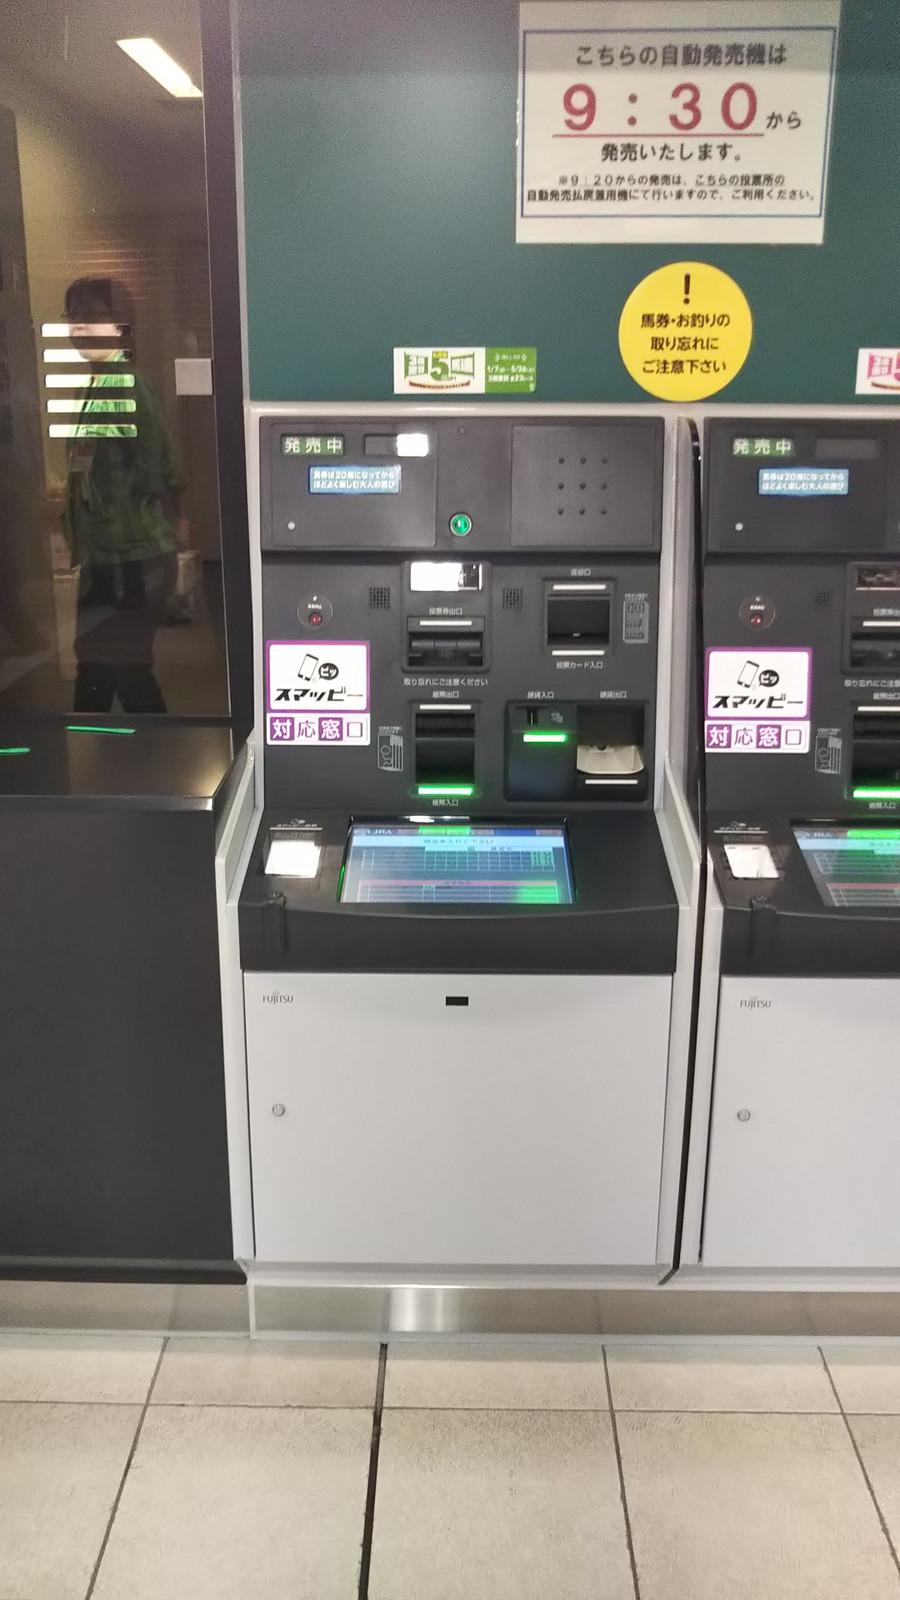 Fuchu_new_vending_machine_smappy